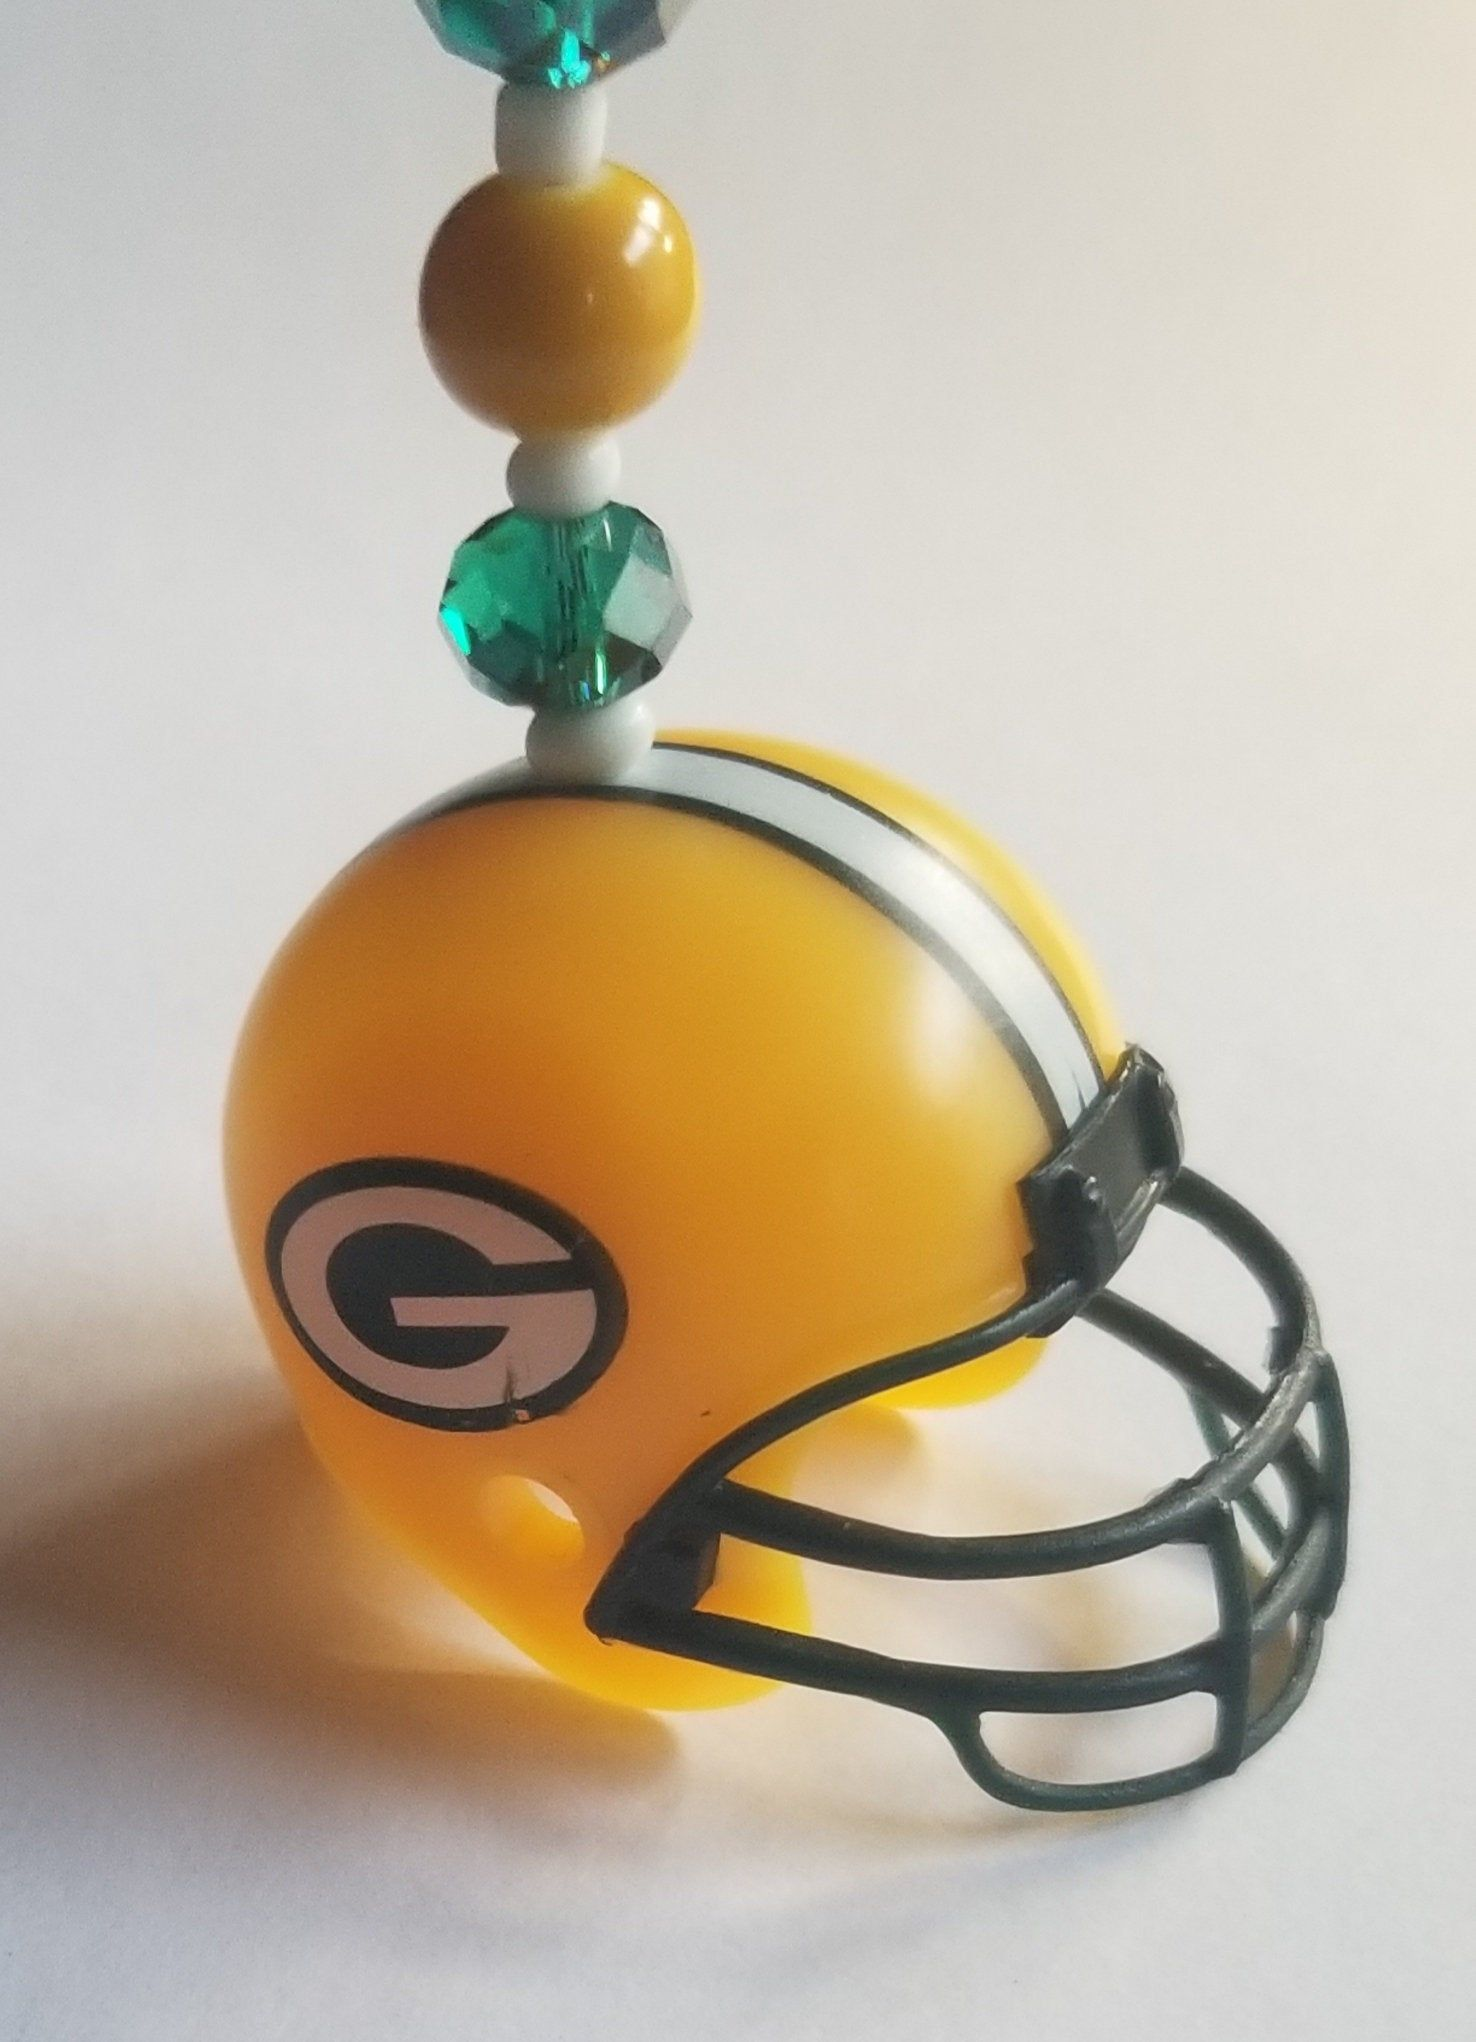 Green Bay Packers Nfl Football Helmet Rear View Mirror Car Charm Sports Gift White Green Gold Yellow In 2020 Nfl Football Helmets Car Charms Football Helmets